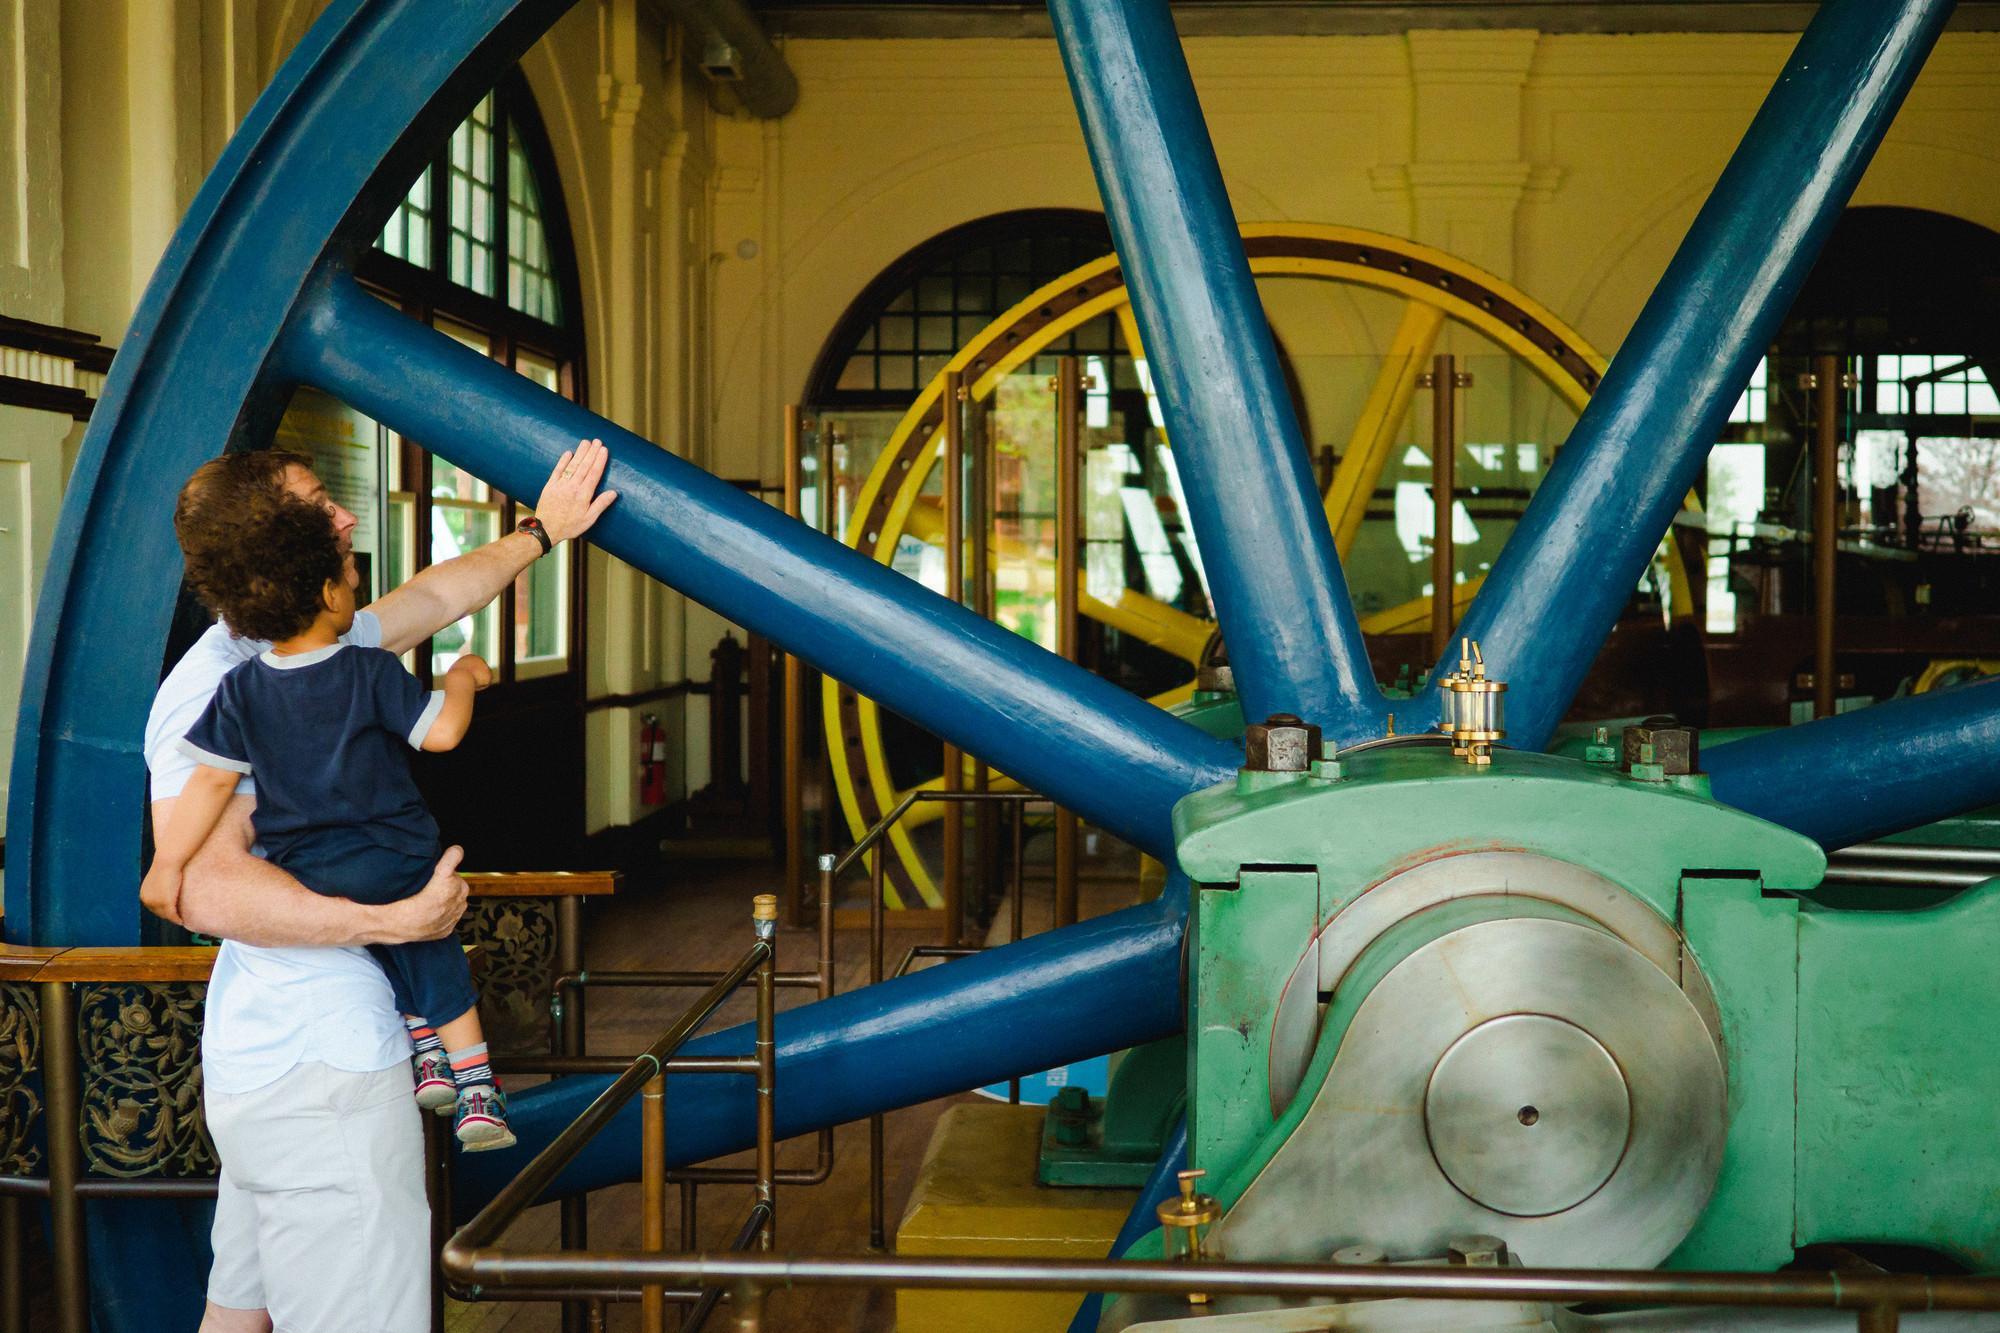 Inside the Pumphouse Museum, an original steam powered waterworks from 1851